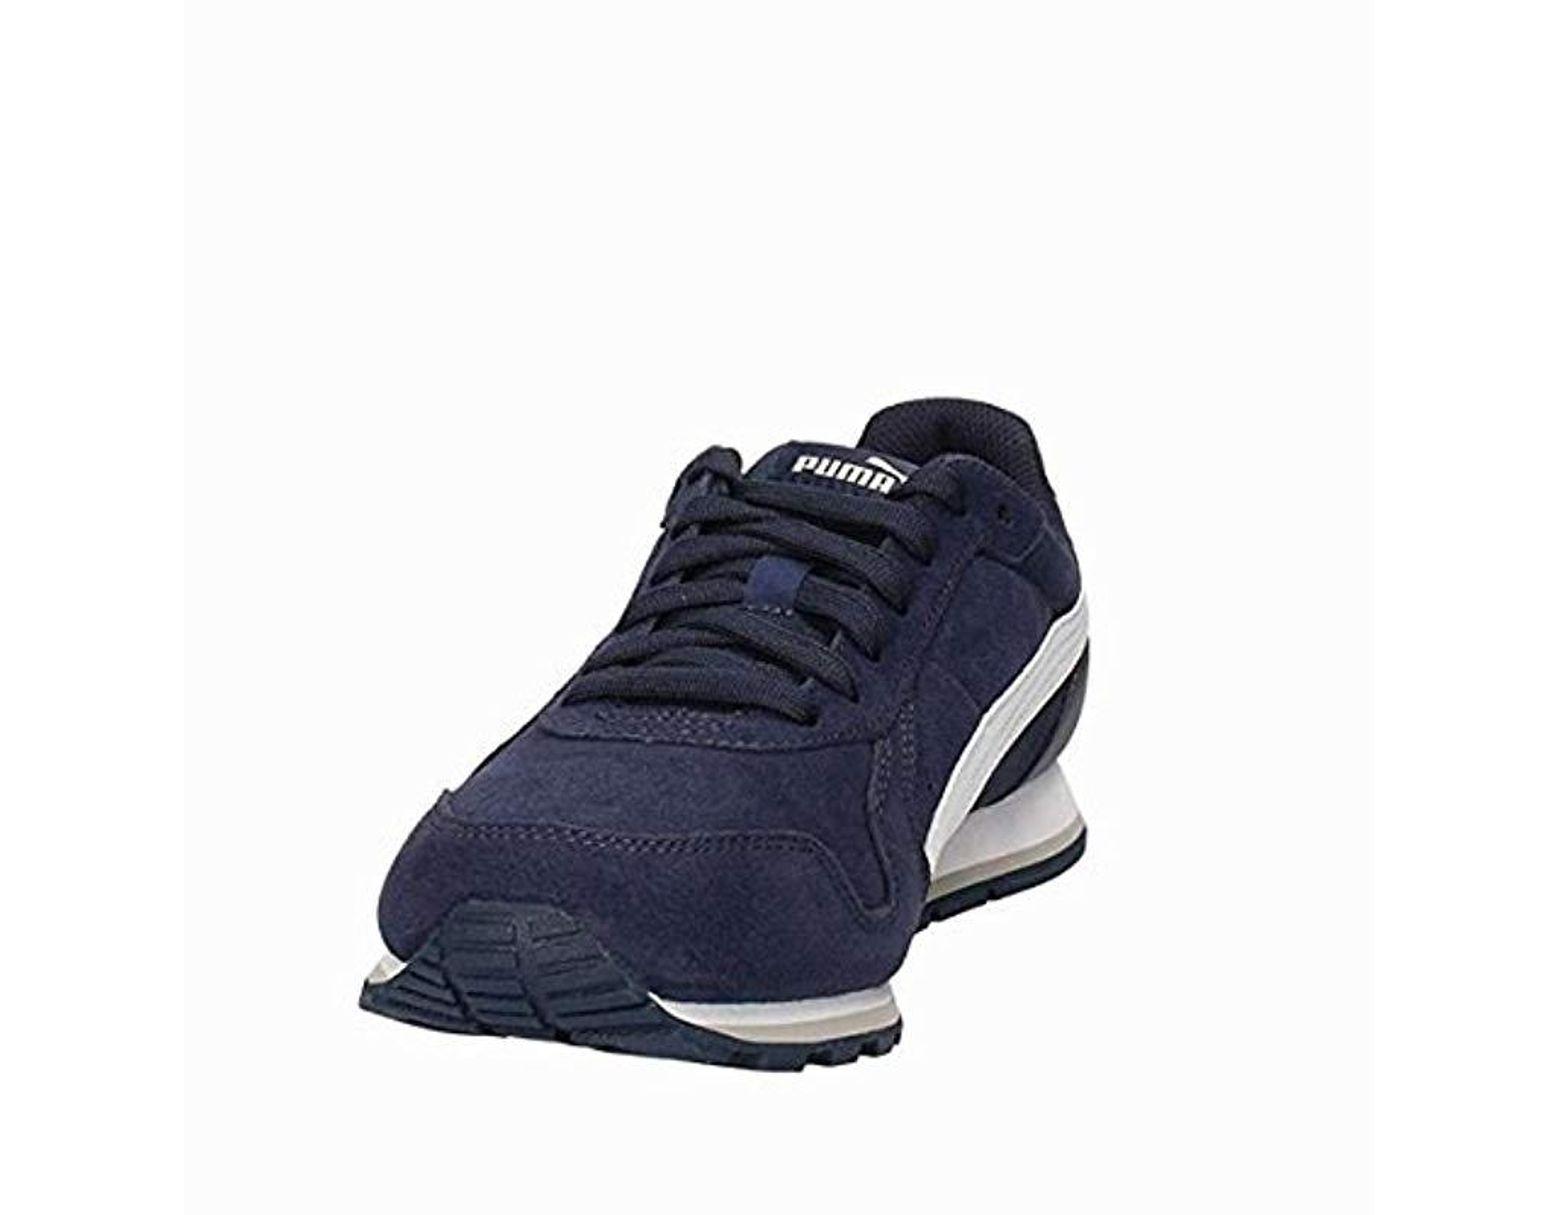 Men's Blue St Runner Sd Sports Casual Trainer Shoes (10 Uk, Peacoatwhite)